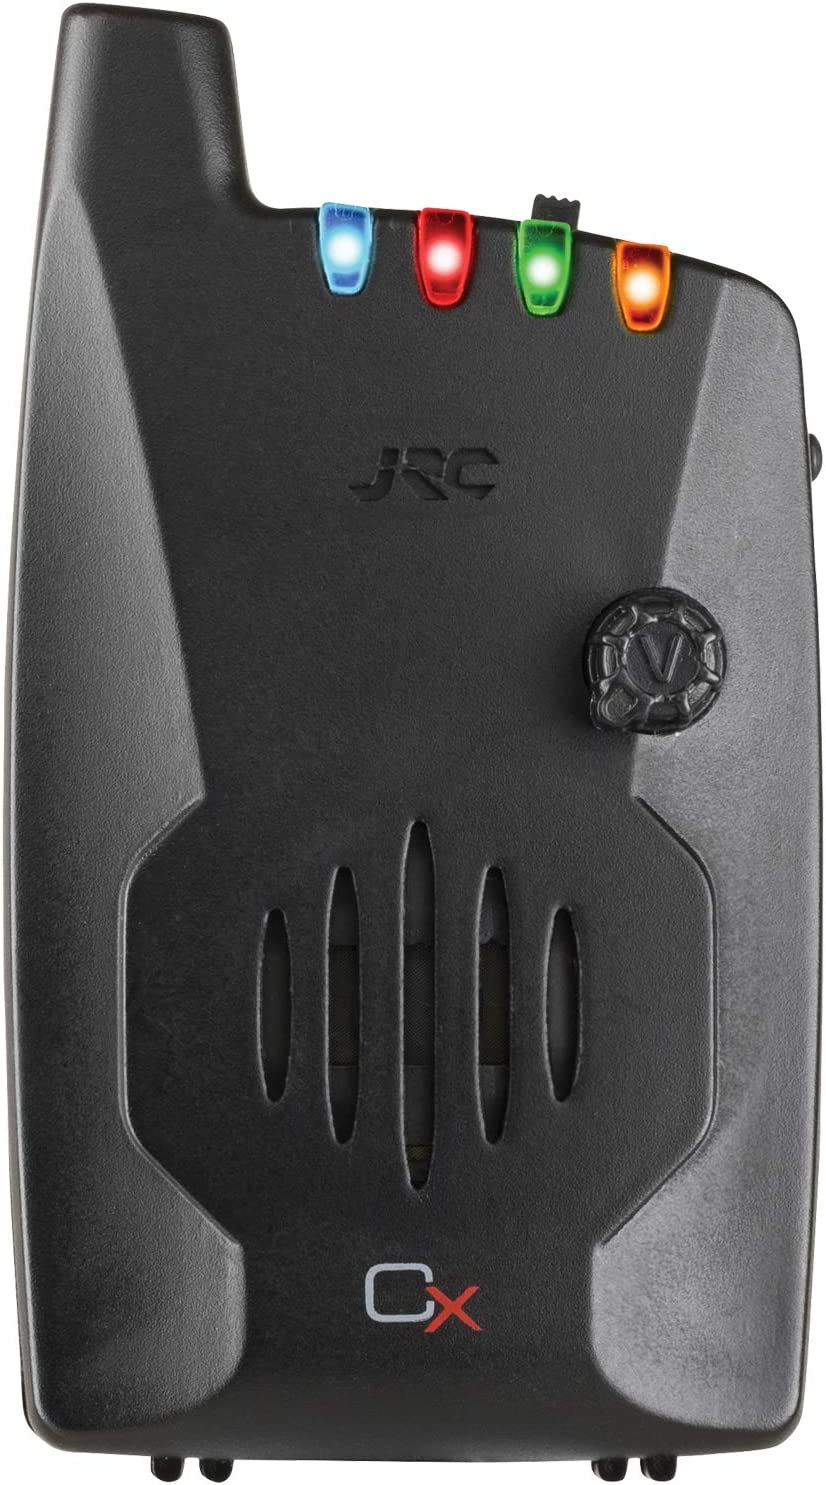 JRC Radar CX Juego de picada 3/ 1/Rojo//Naranja//Green 1404484/bit eindicator Bite Indicator picada Set